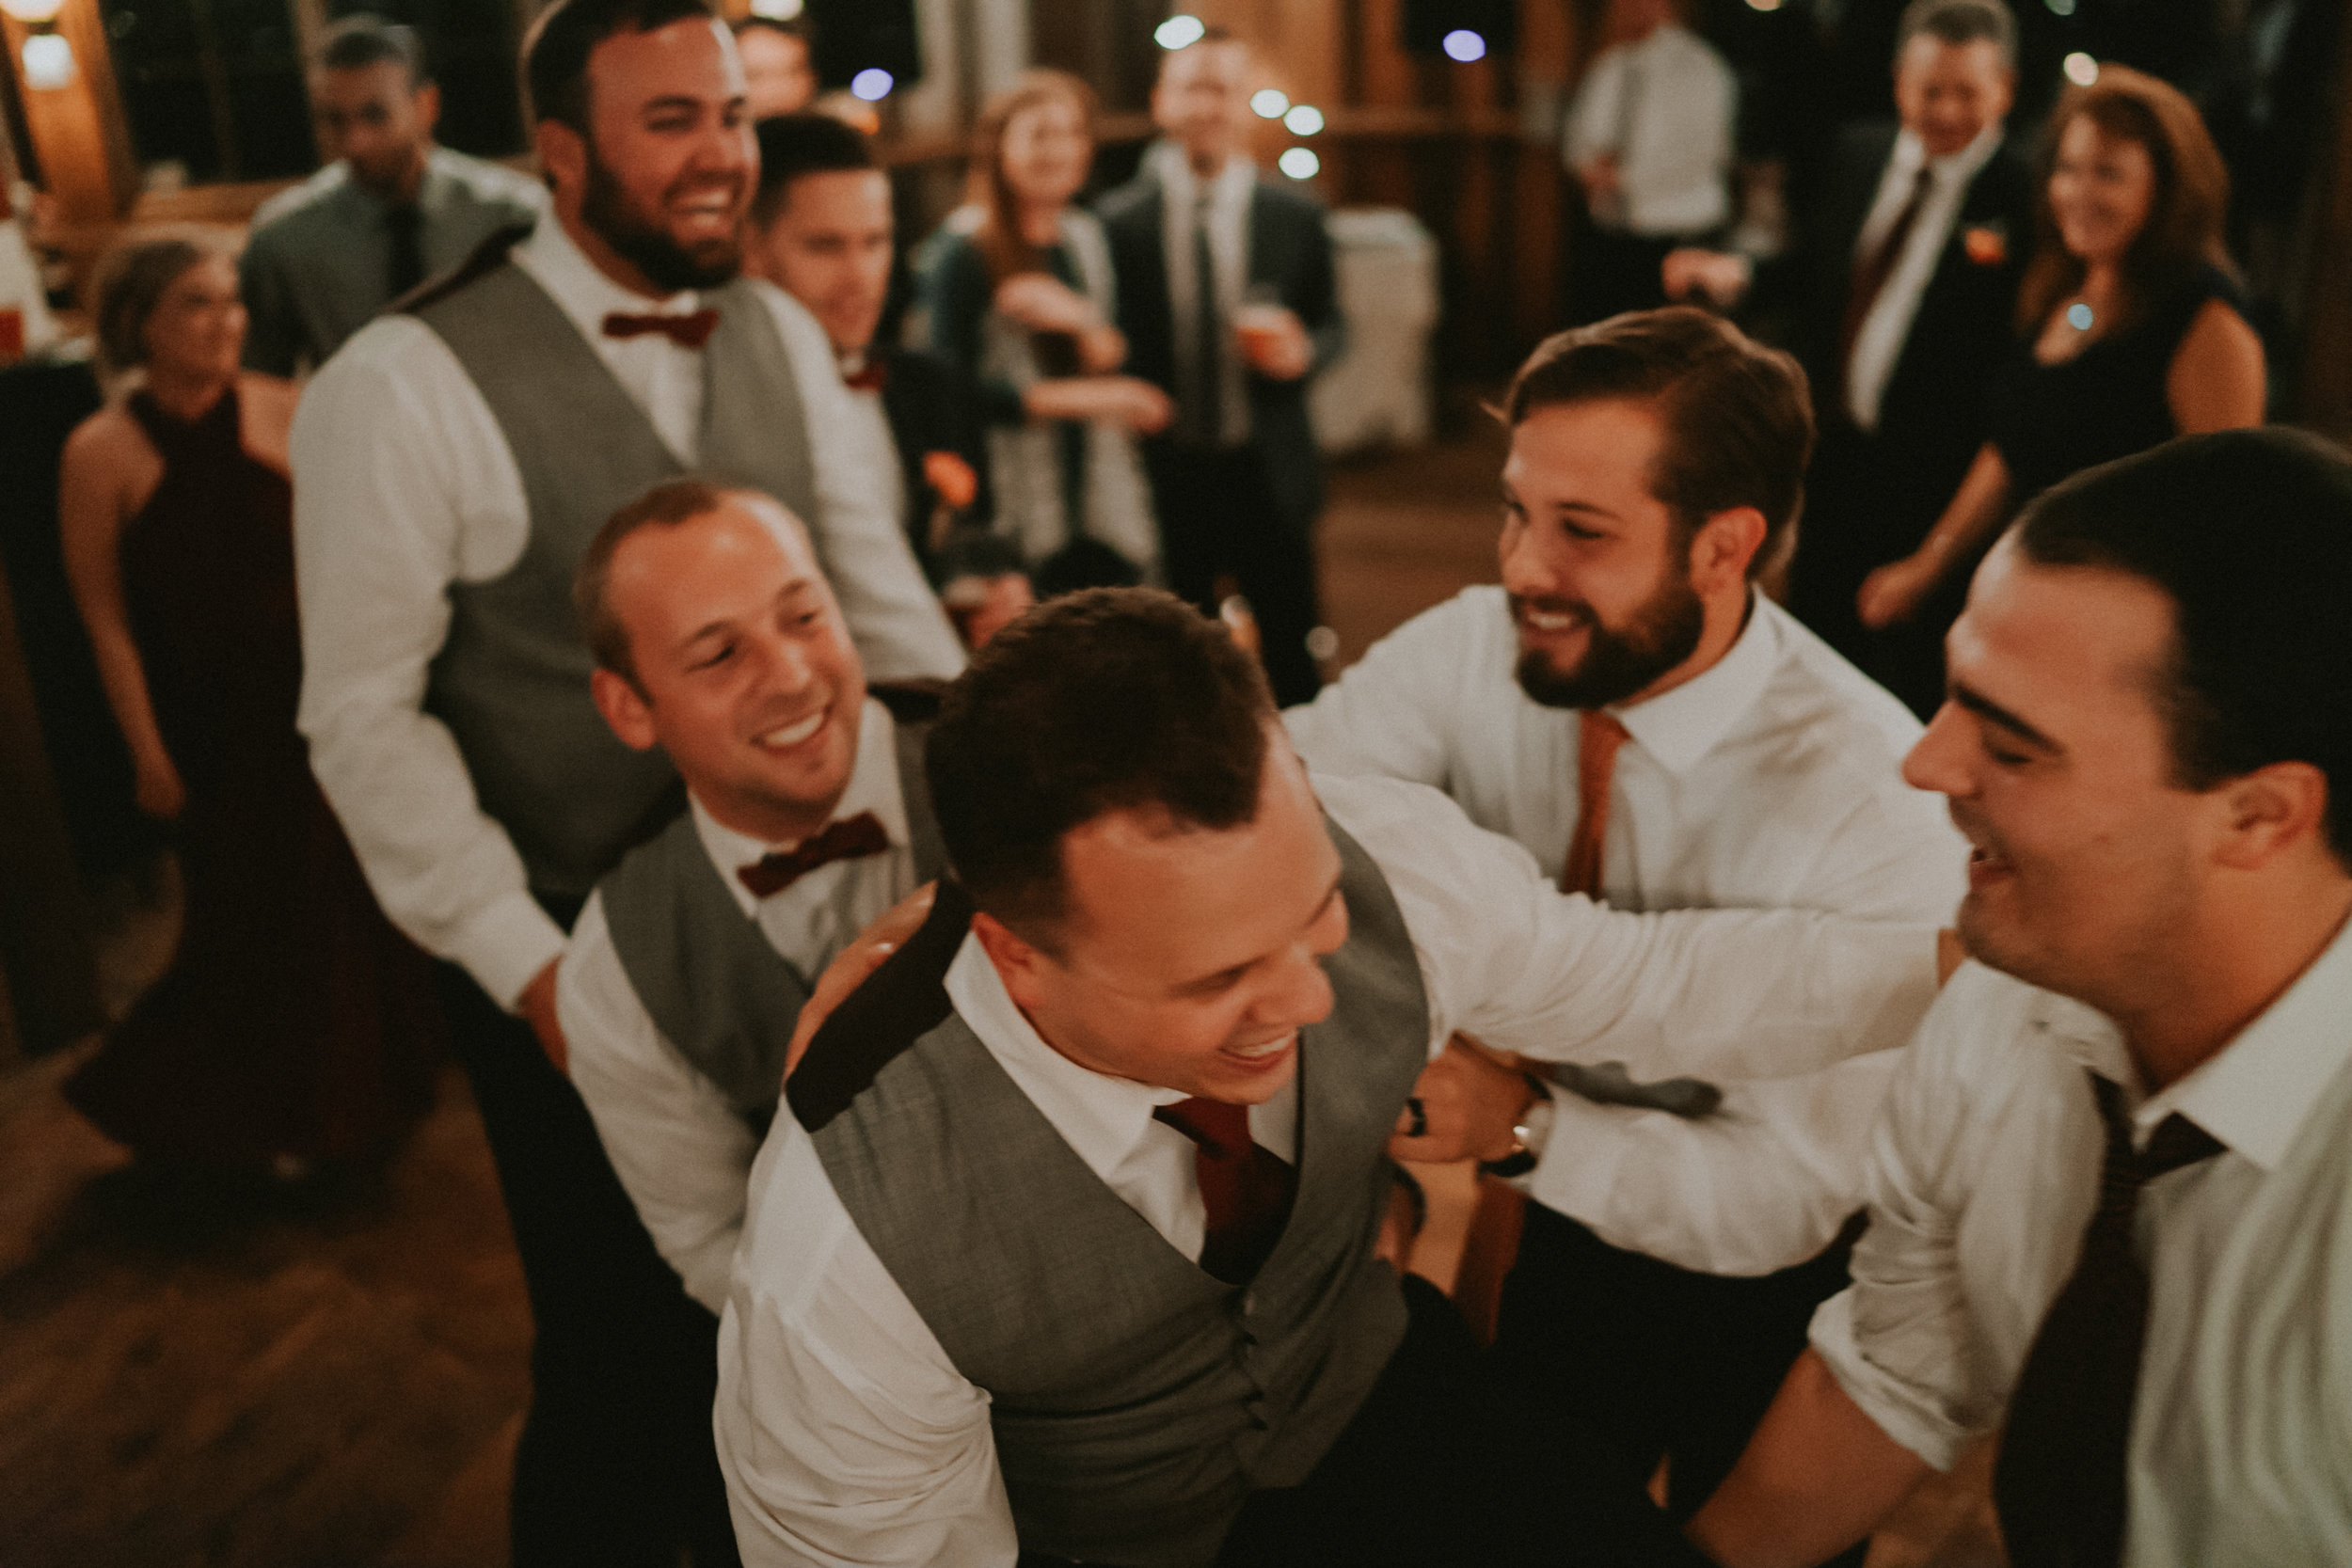 Portland_wedding_photographer_McMenamins_Alfred_Tang-107.jpg